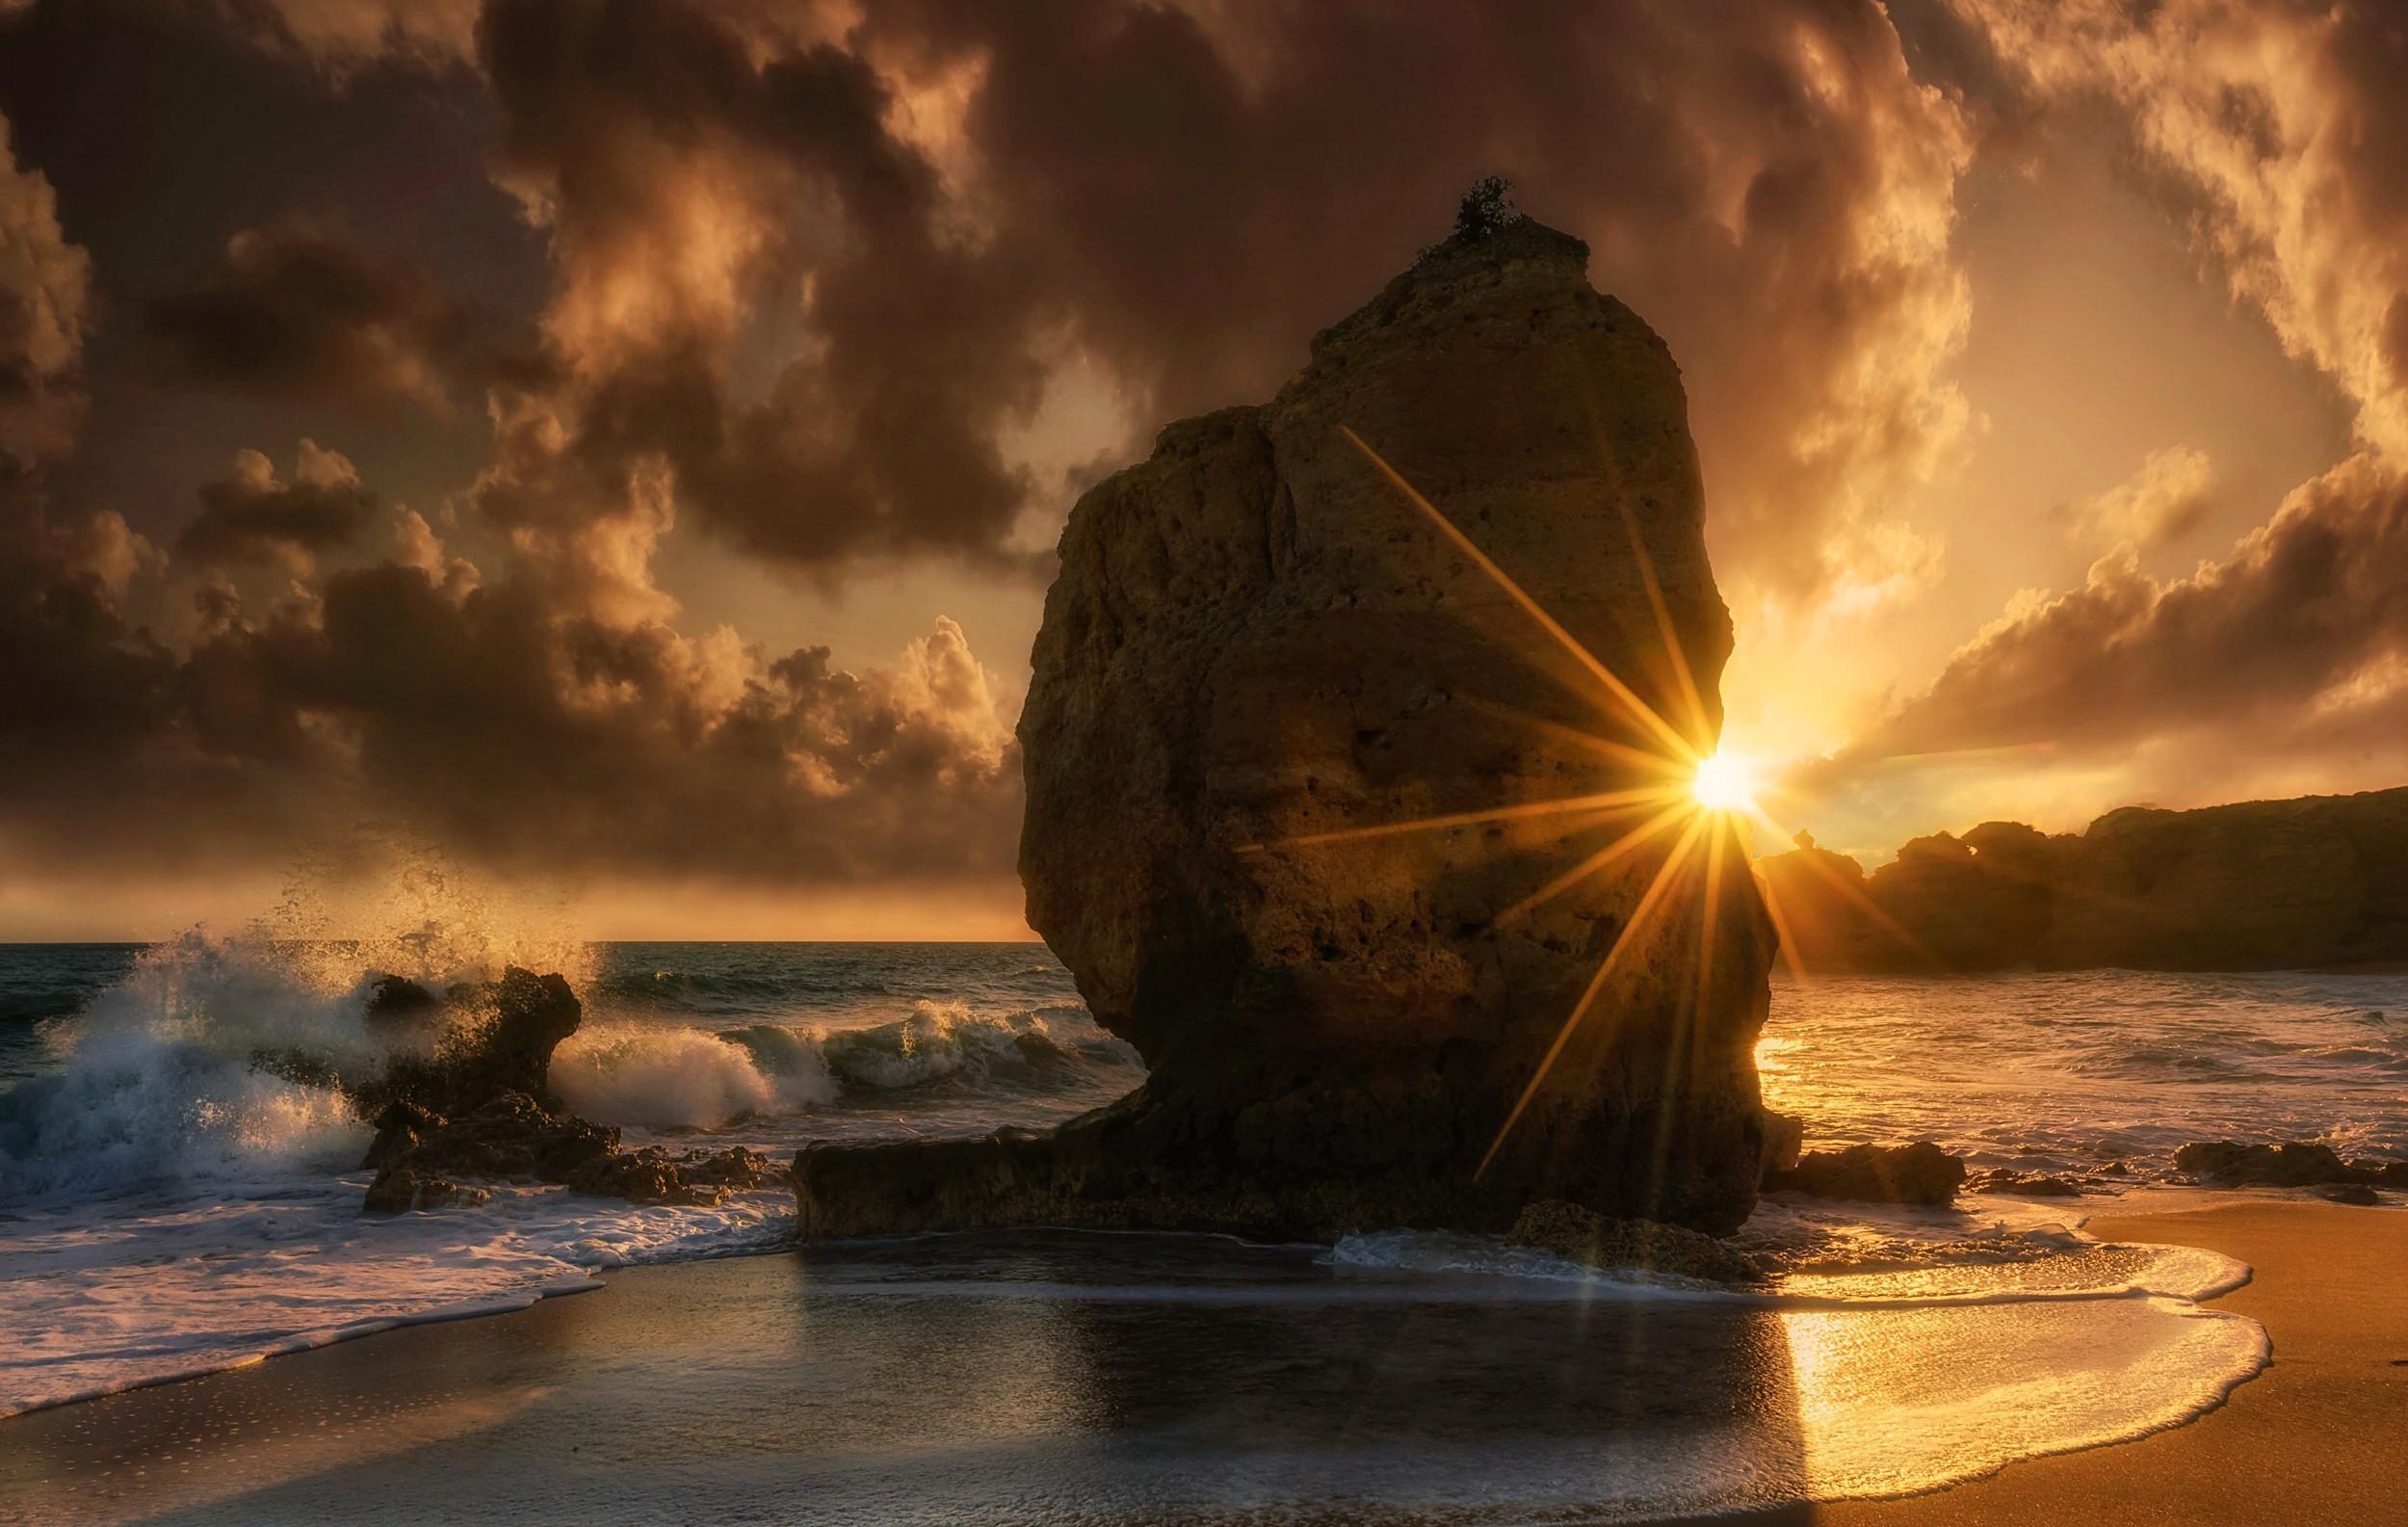 Море солнце лучи Sea the sun rays  № 1623324 загрузить